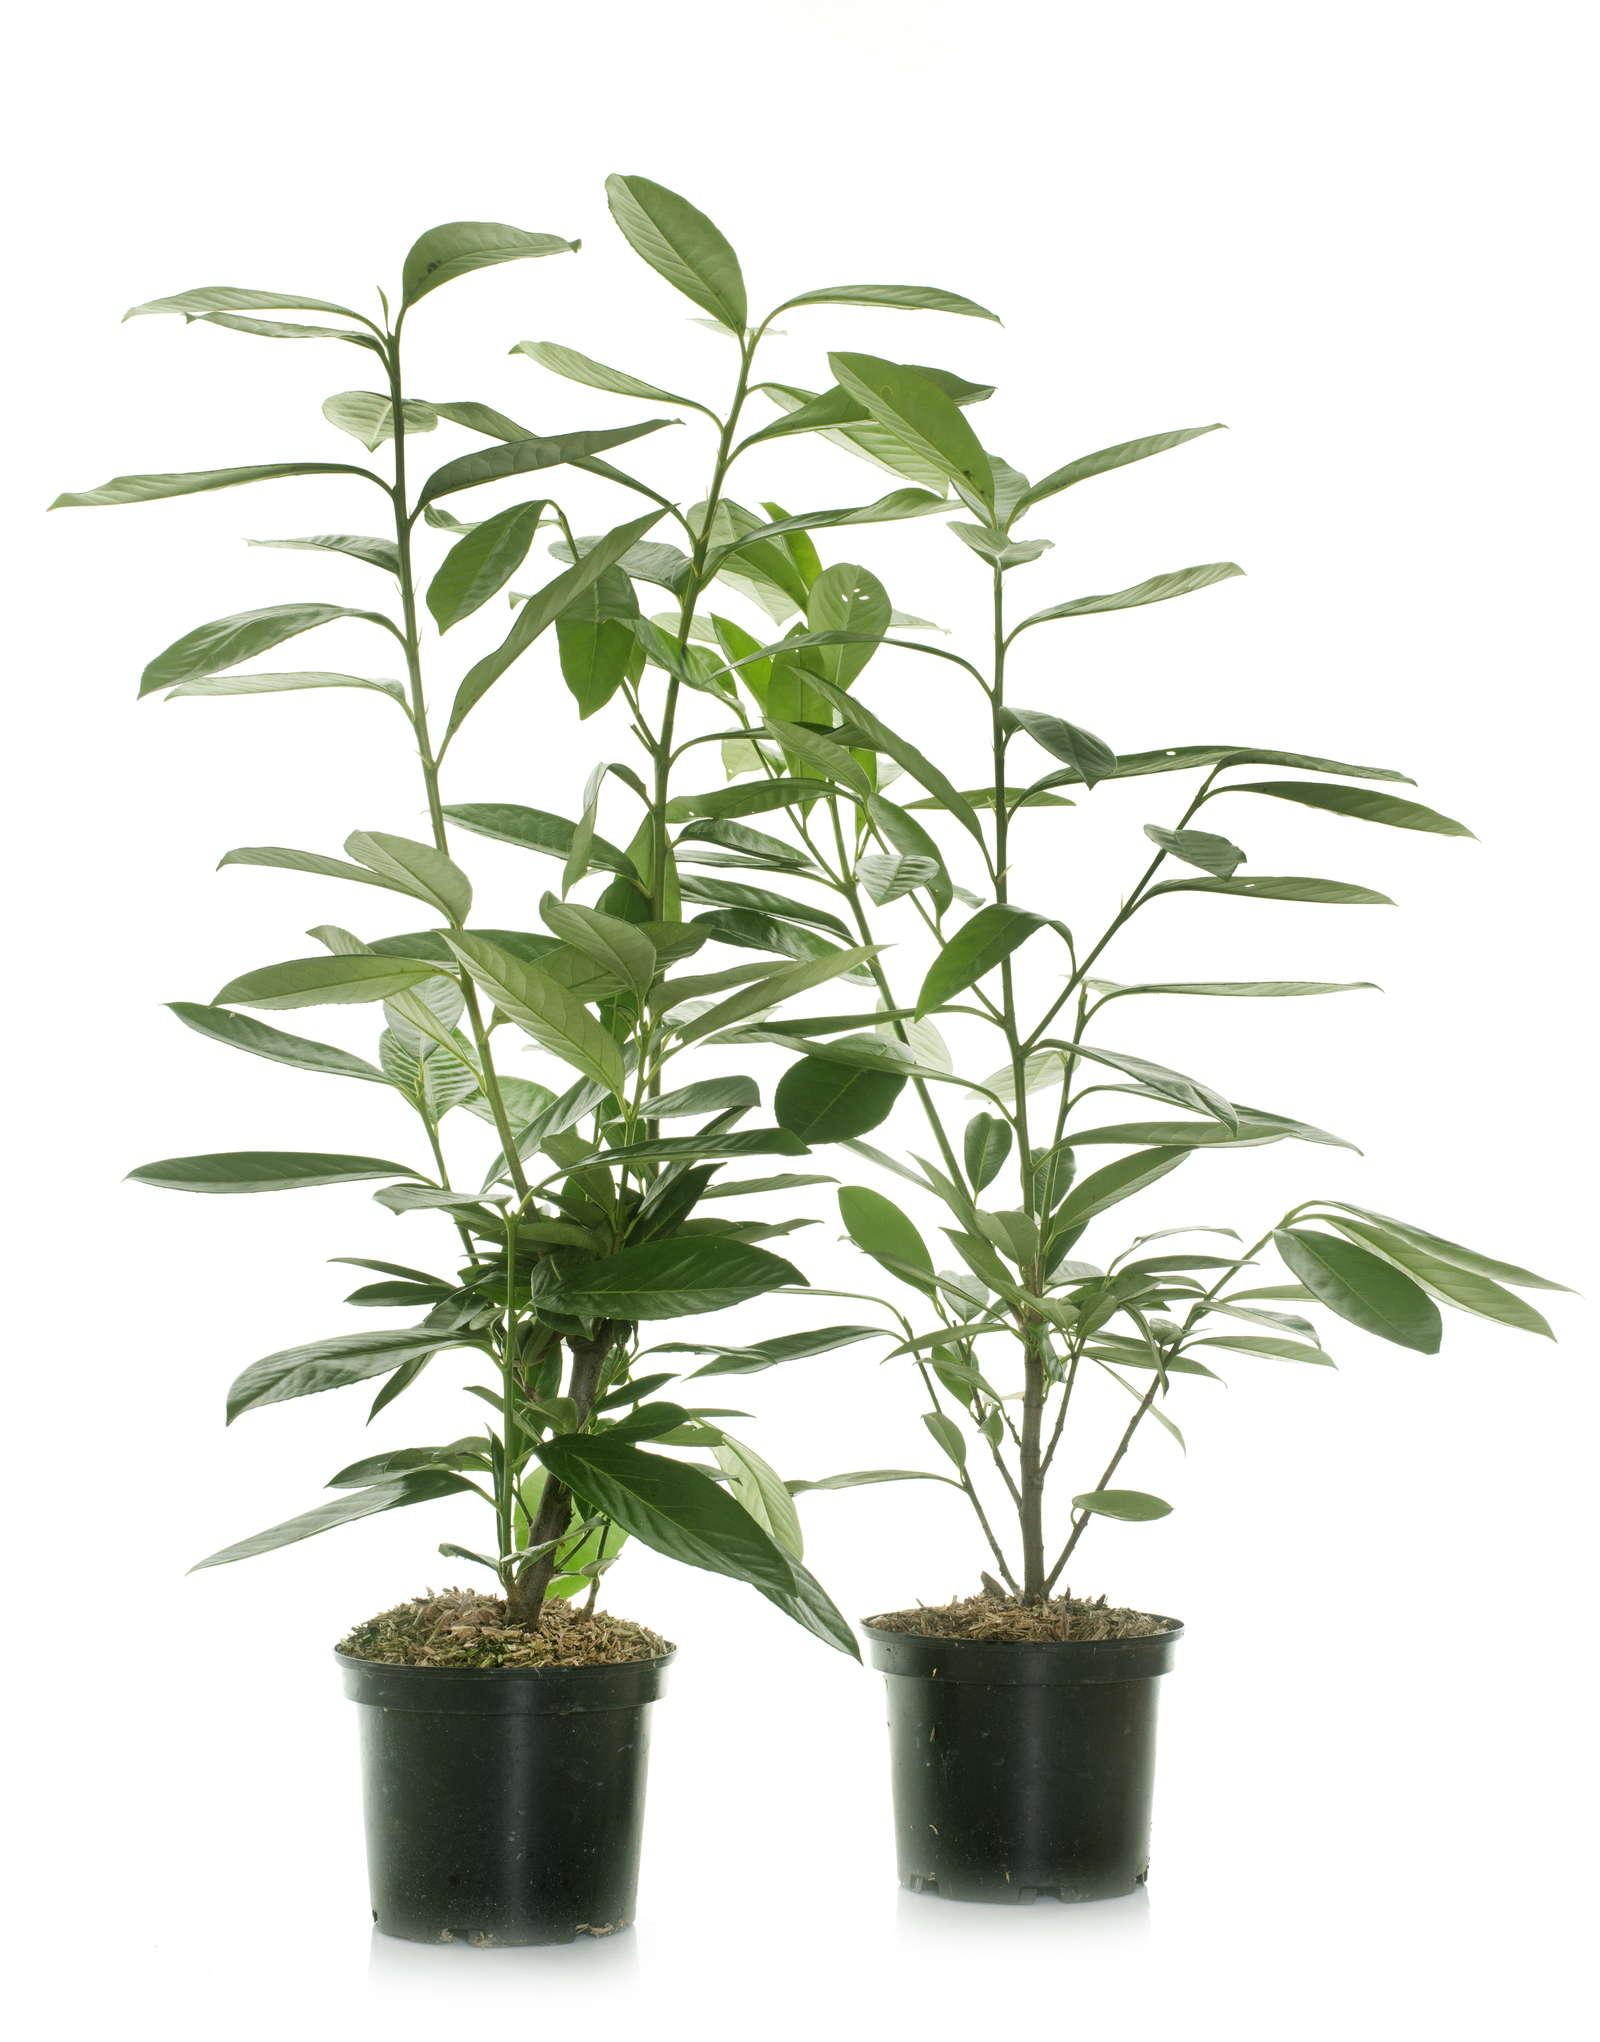 Berühmt Kirschlorbeer vermehren: Tipps & Anleitung vom Profi - Plantura #ES_45